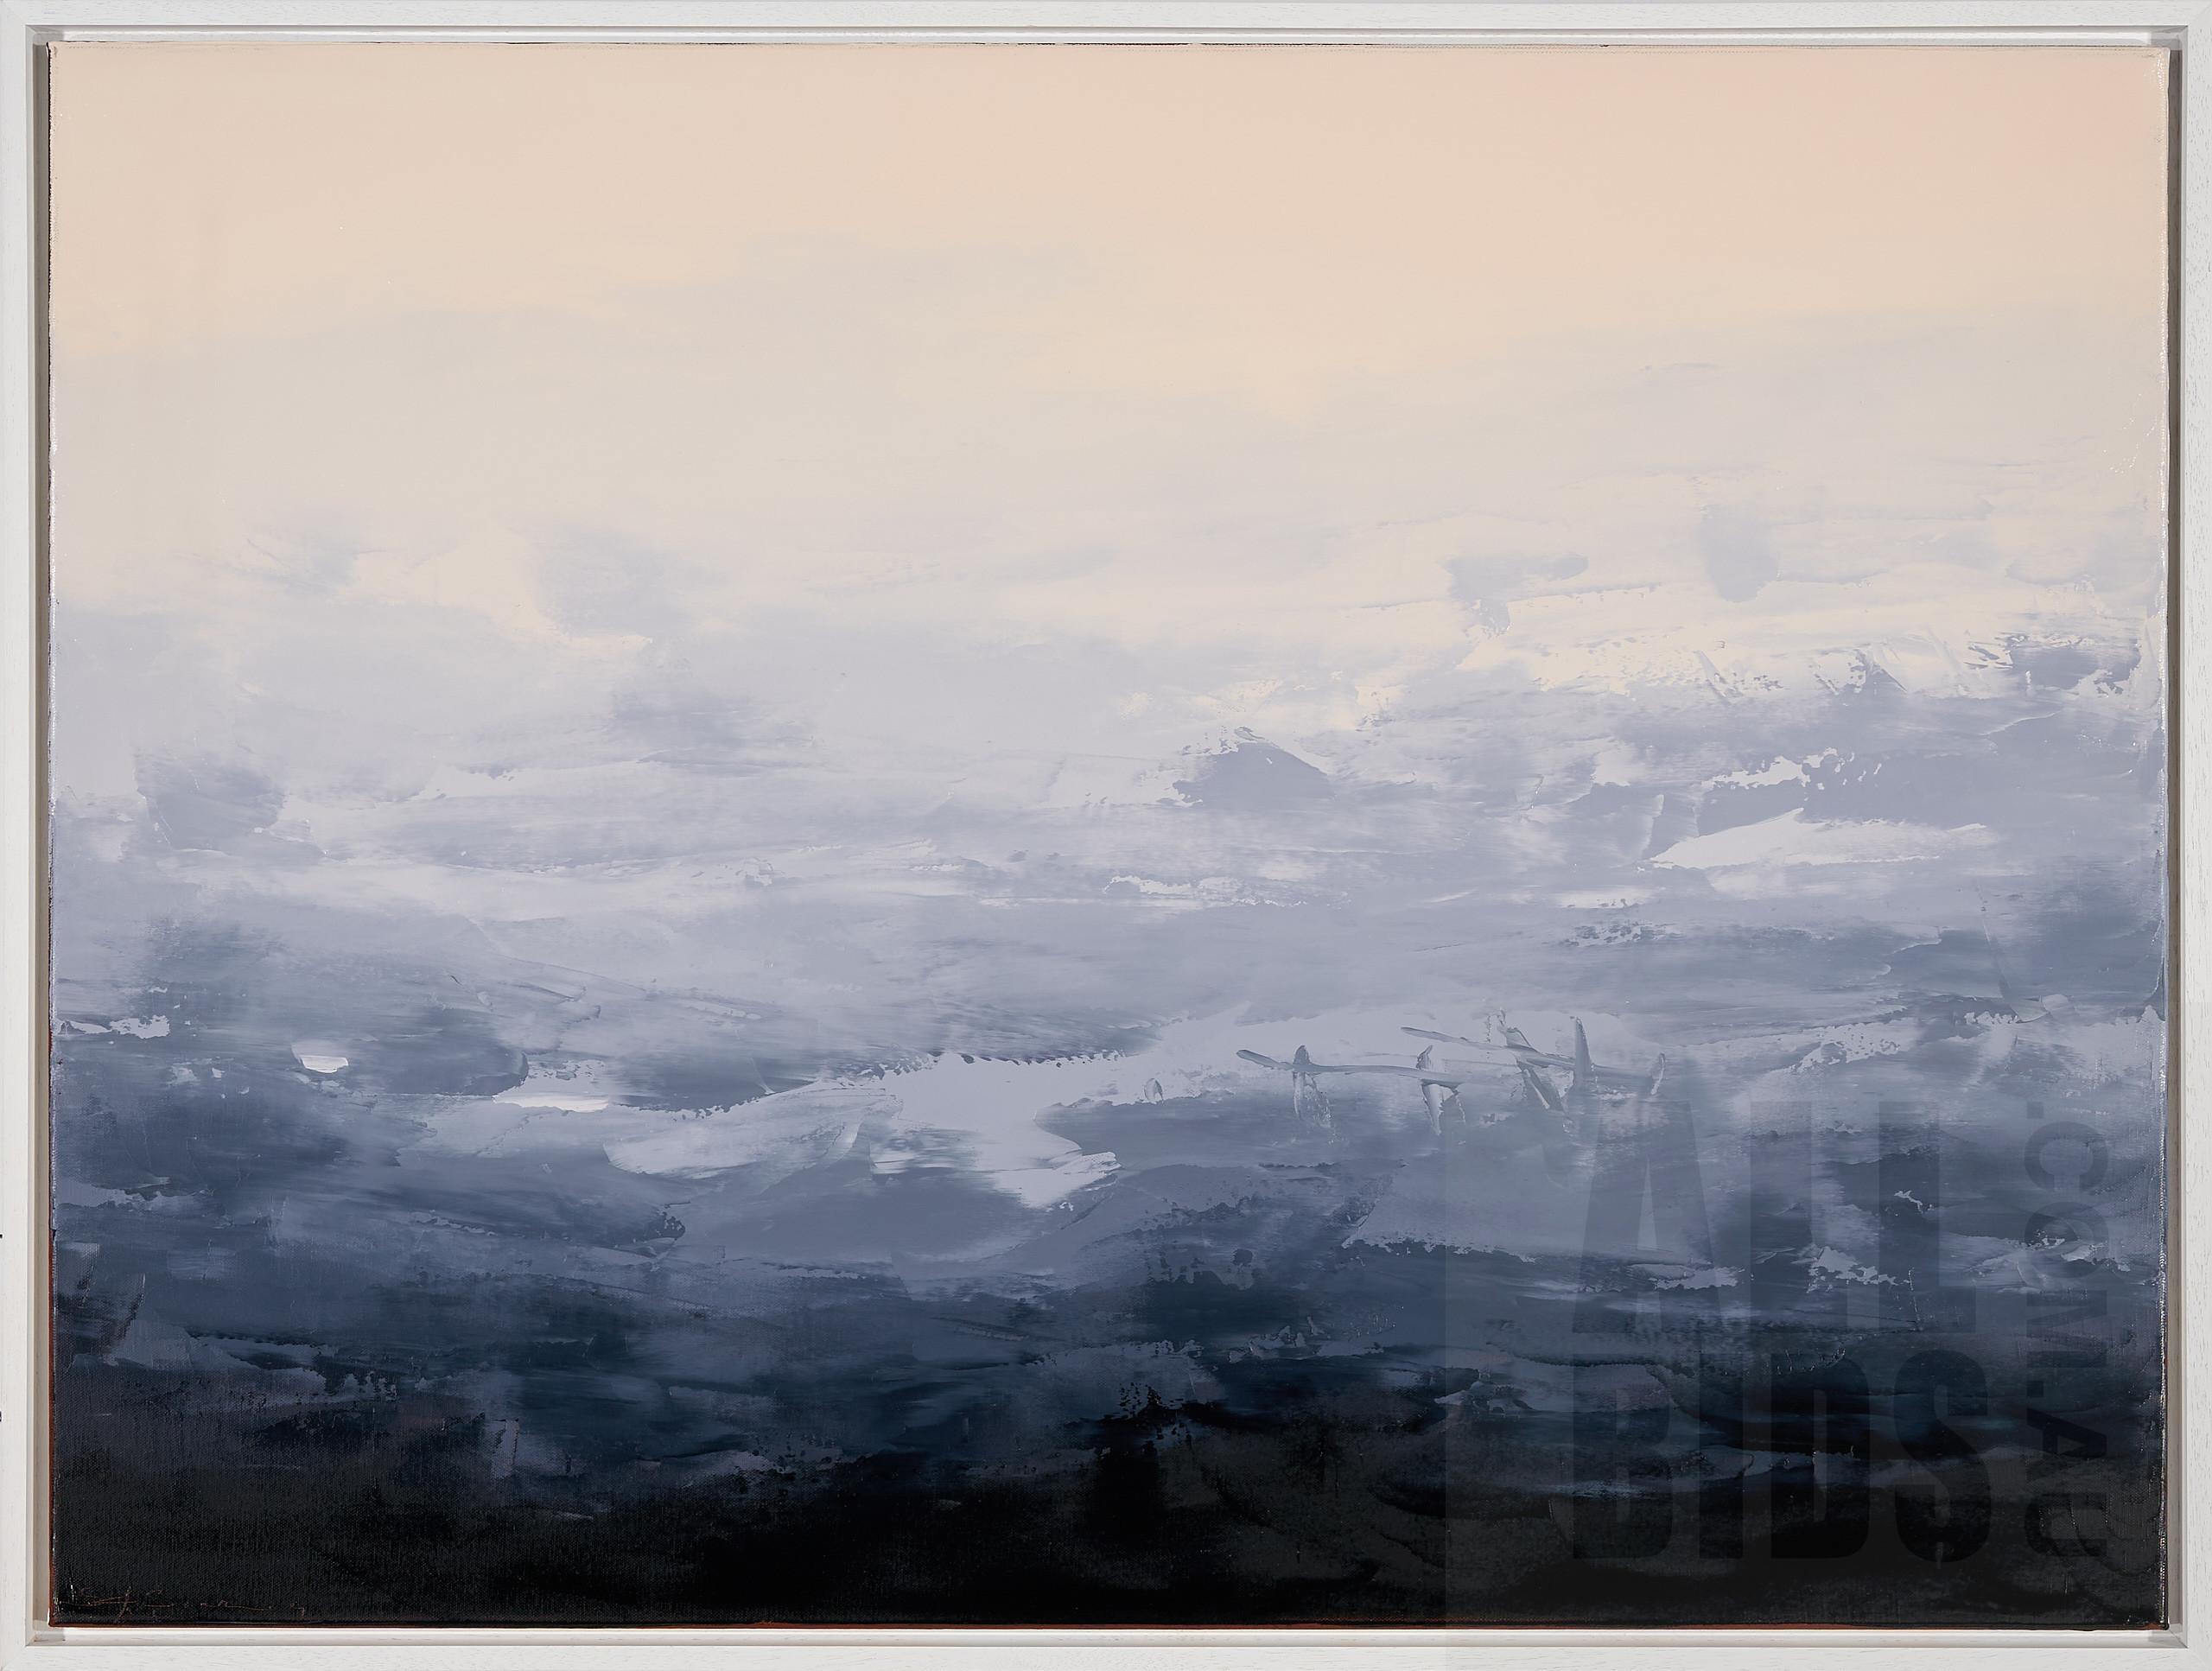 'Sokquon Tran (born 1969), Southern Highlands at Dusk, Oil on Canvas, 76 x 101.5 cm'